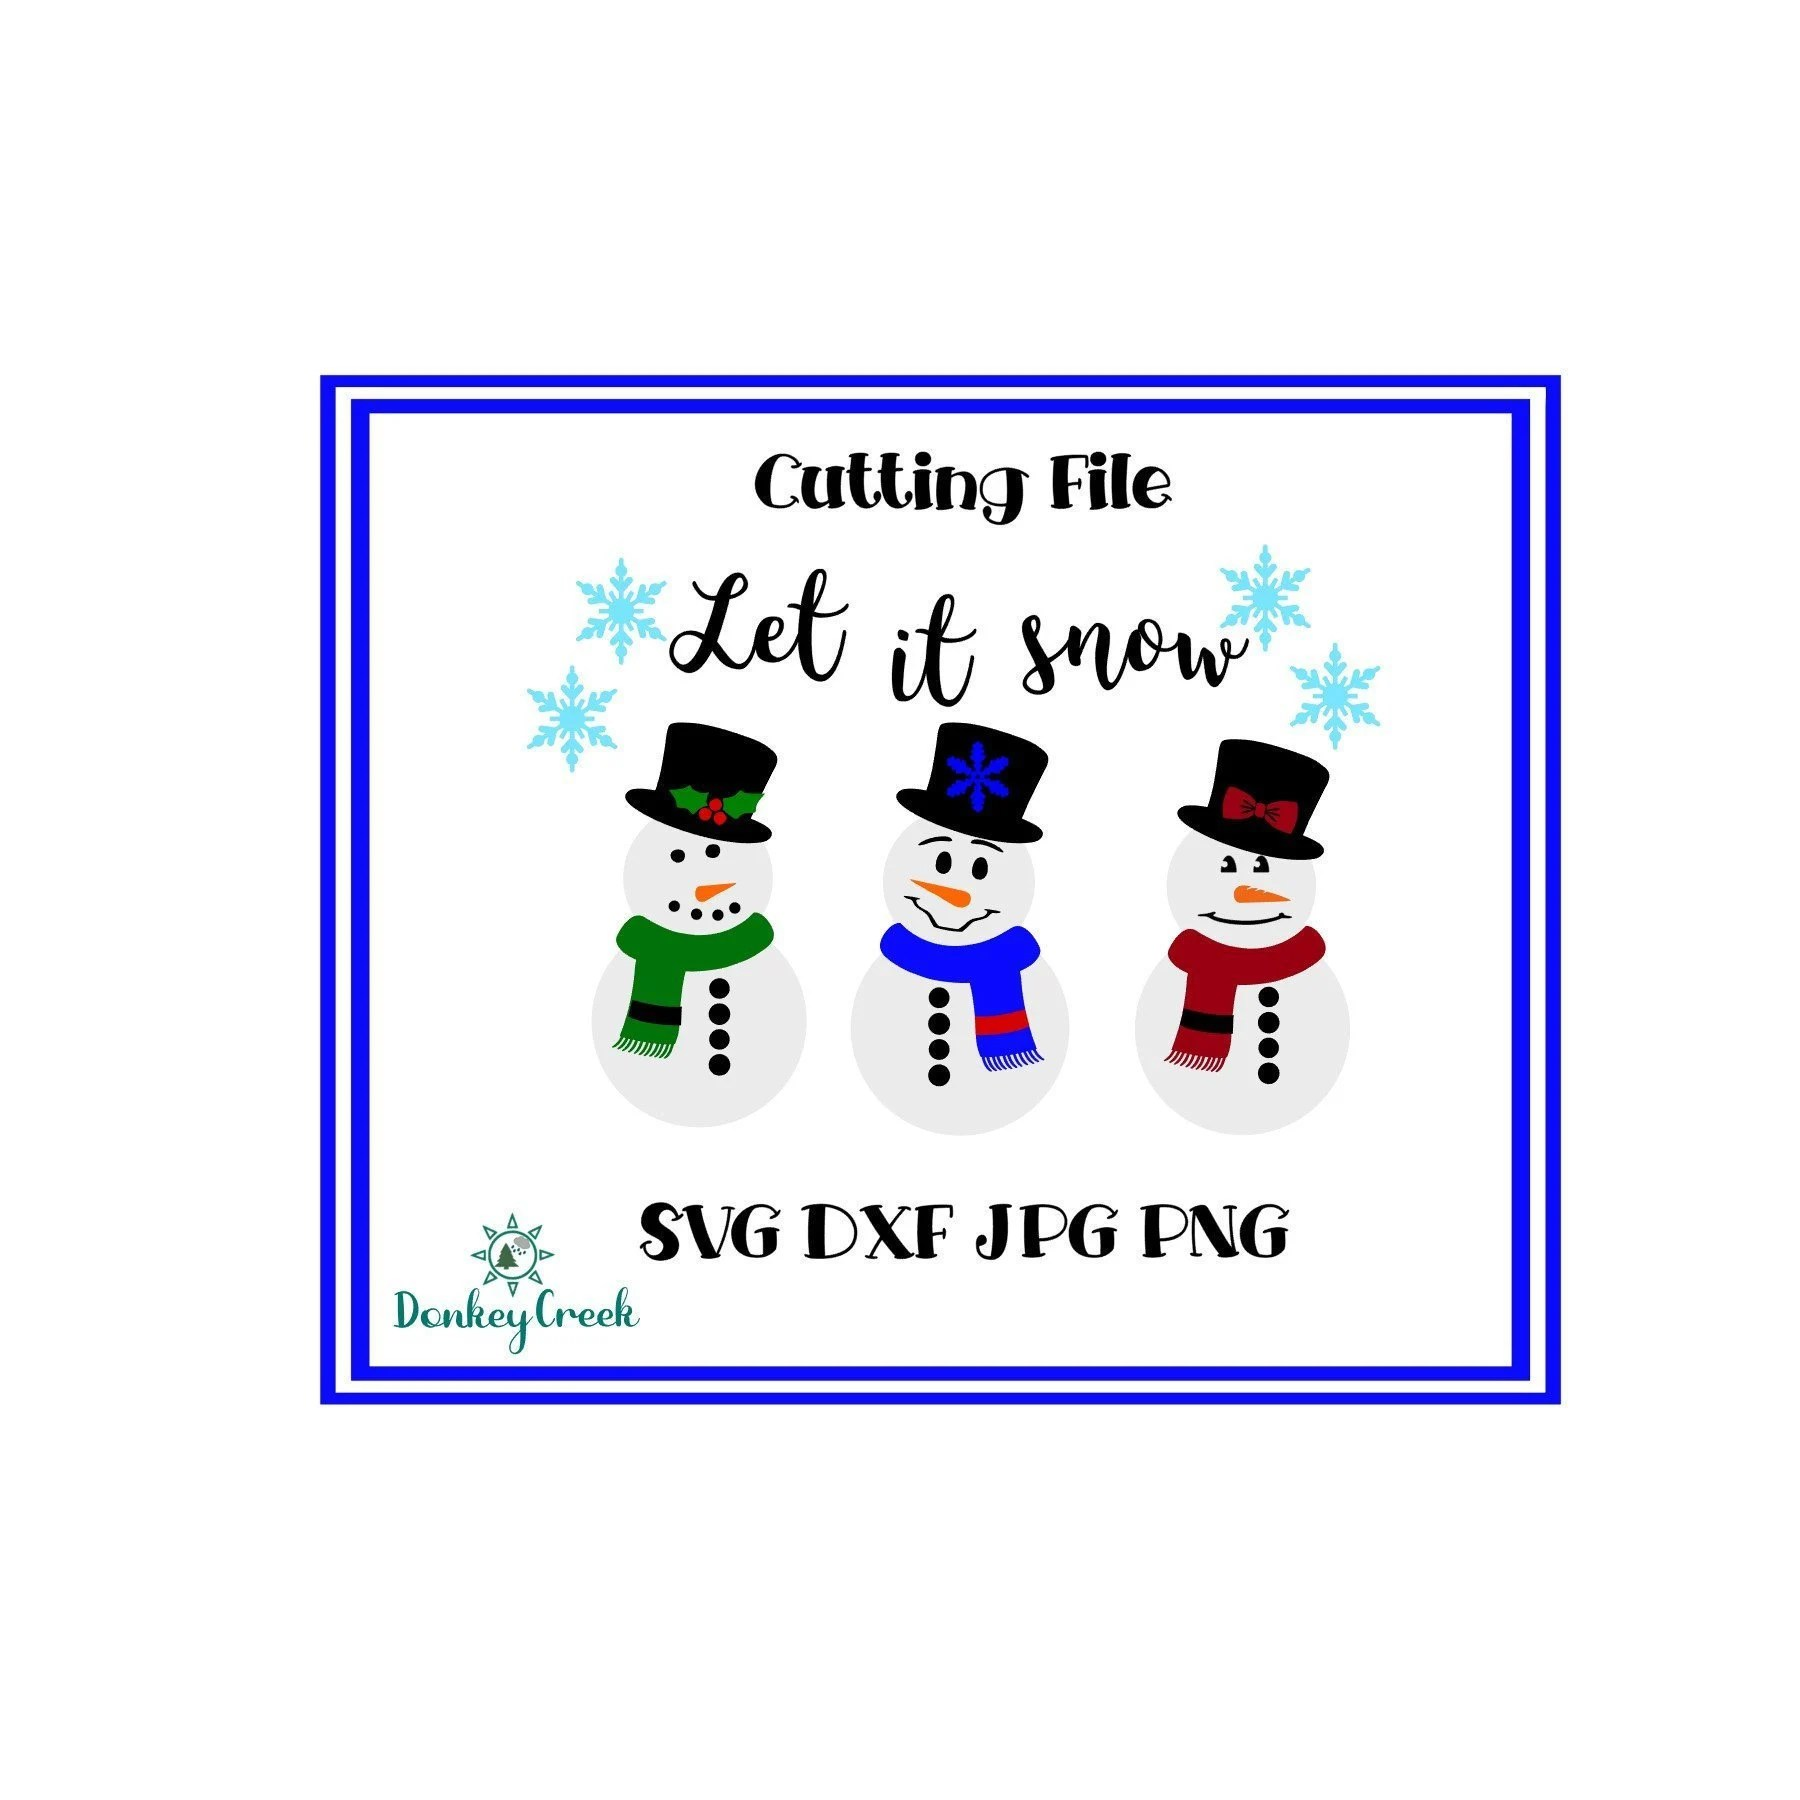 Let it snow SVG snowman silhouette file Christmas svg Etsy